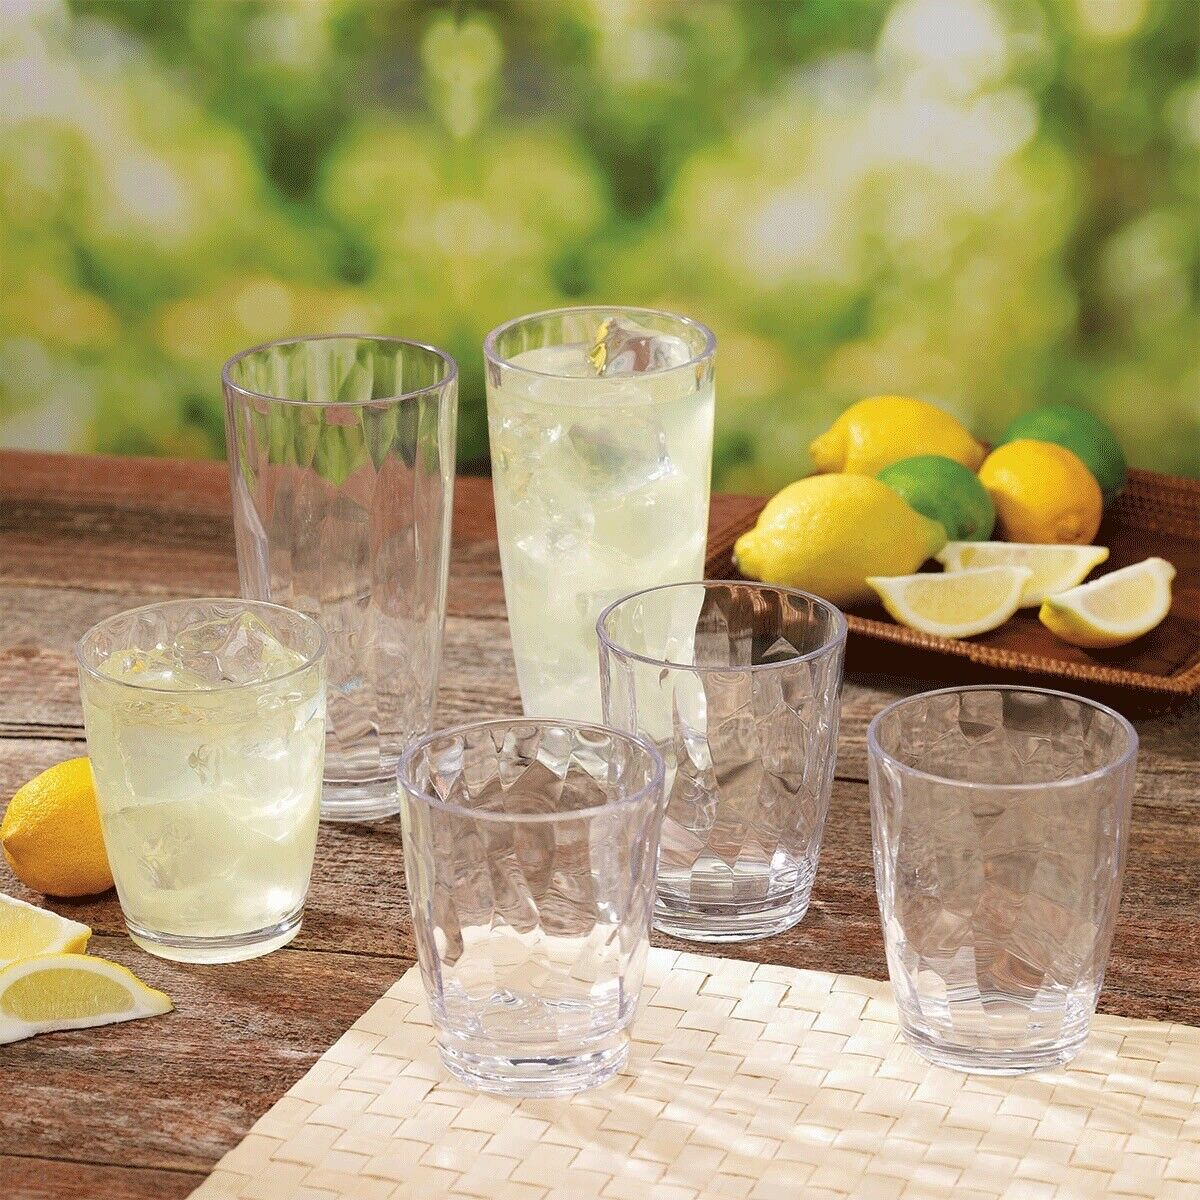 Tritan Clear Crystal Cut Acrylic Drinkware 12 Piece Set Quality Tumblers